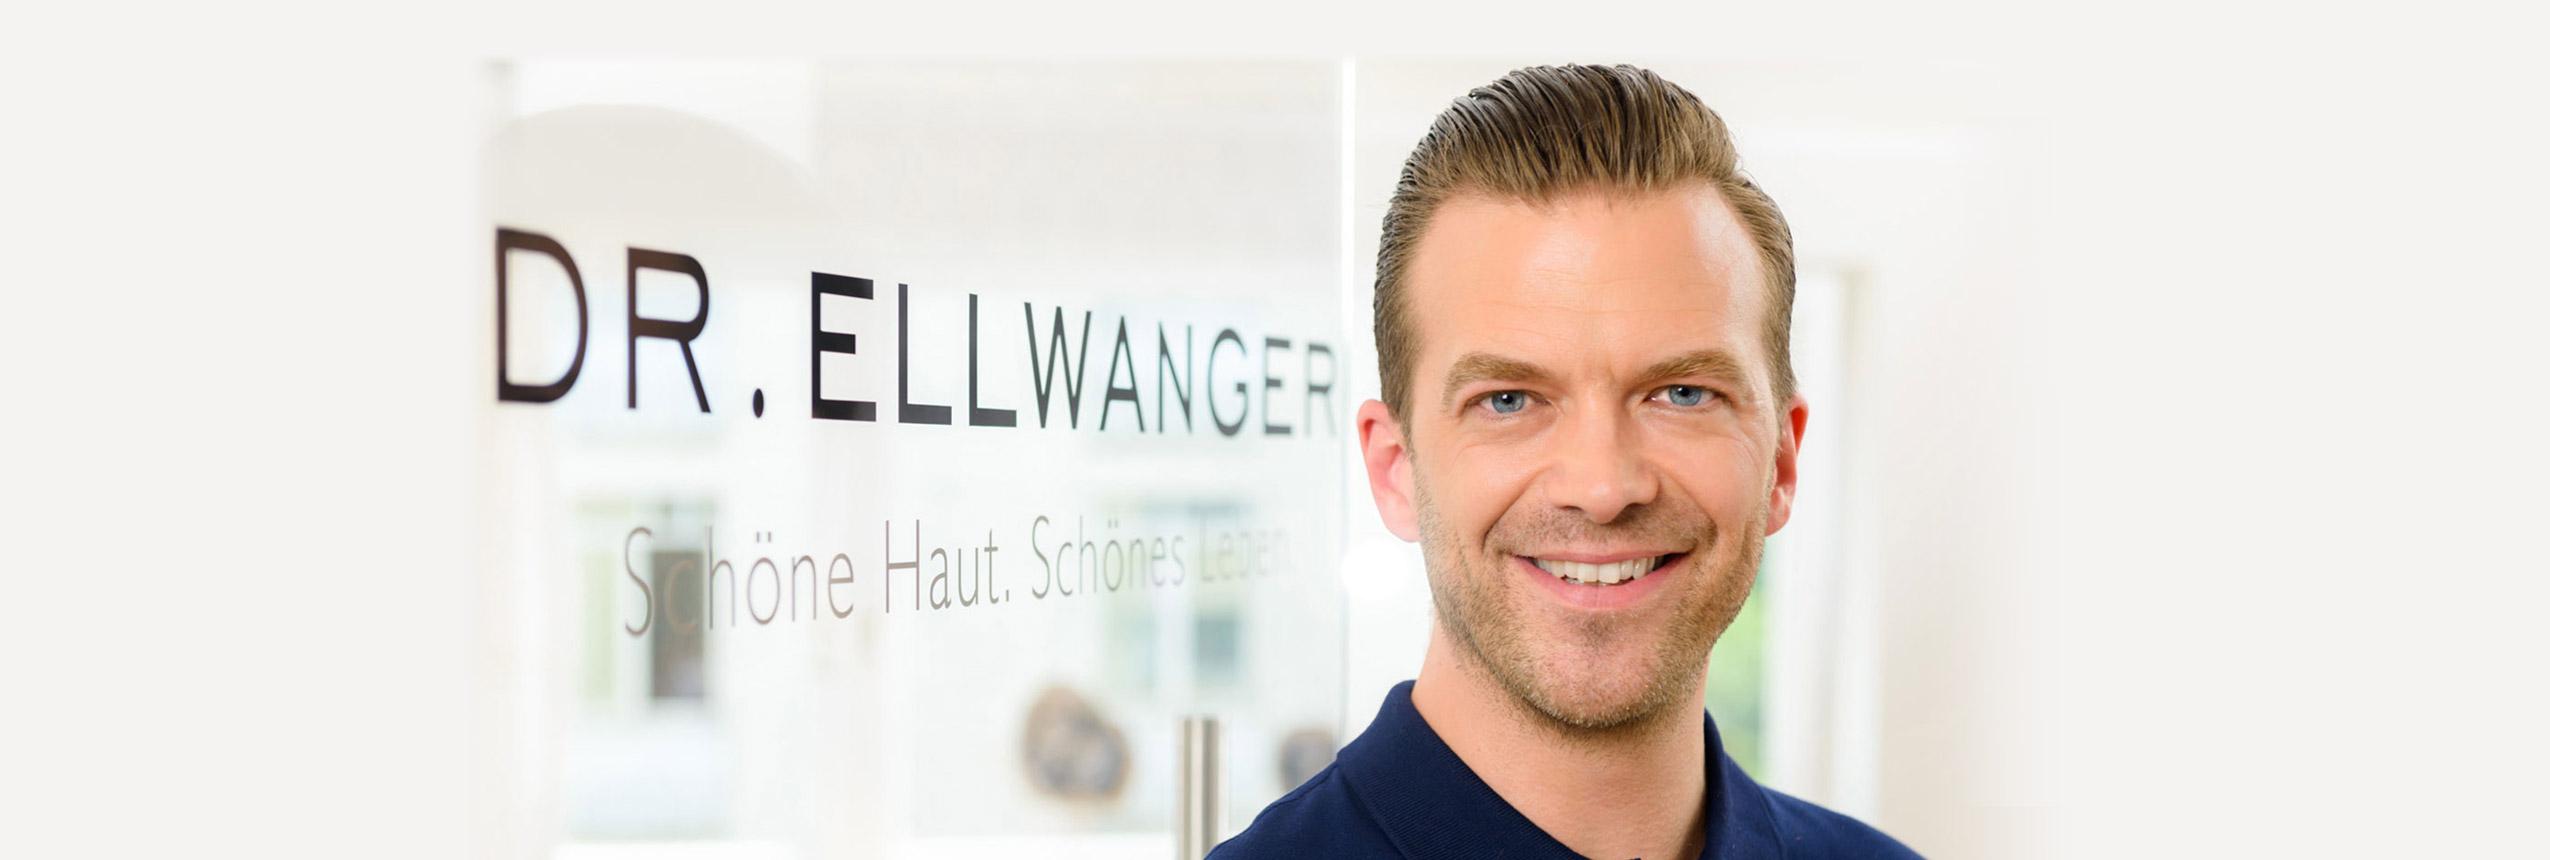 dr ellwanger dermatologe in muenchen 02 - Dr. Ellwanger